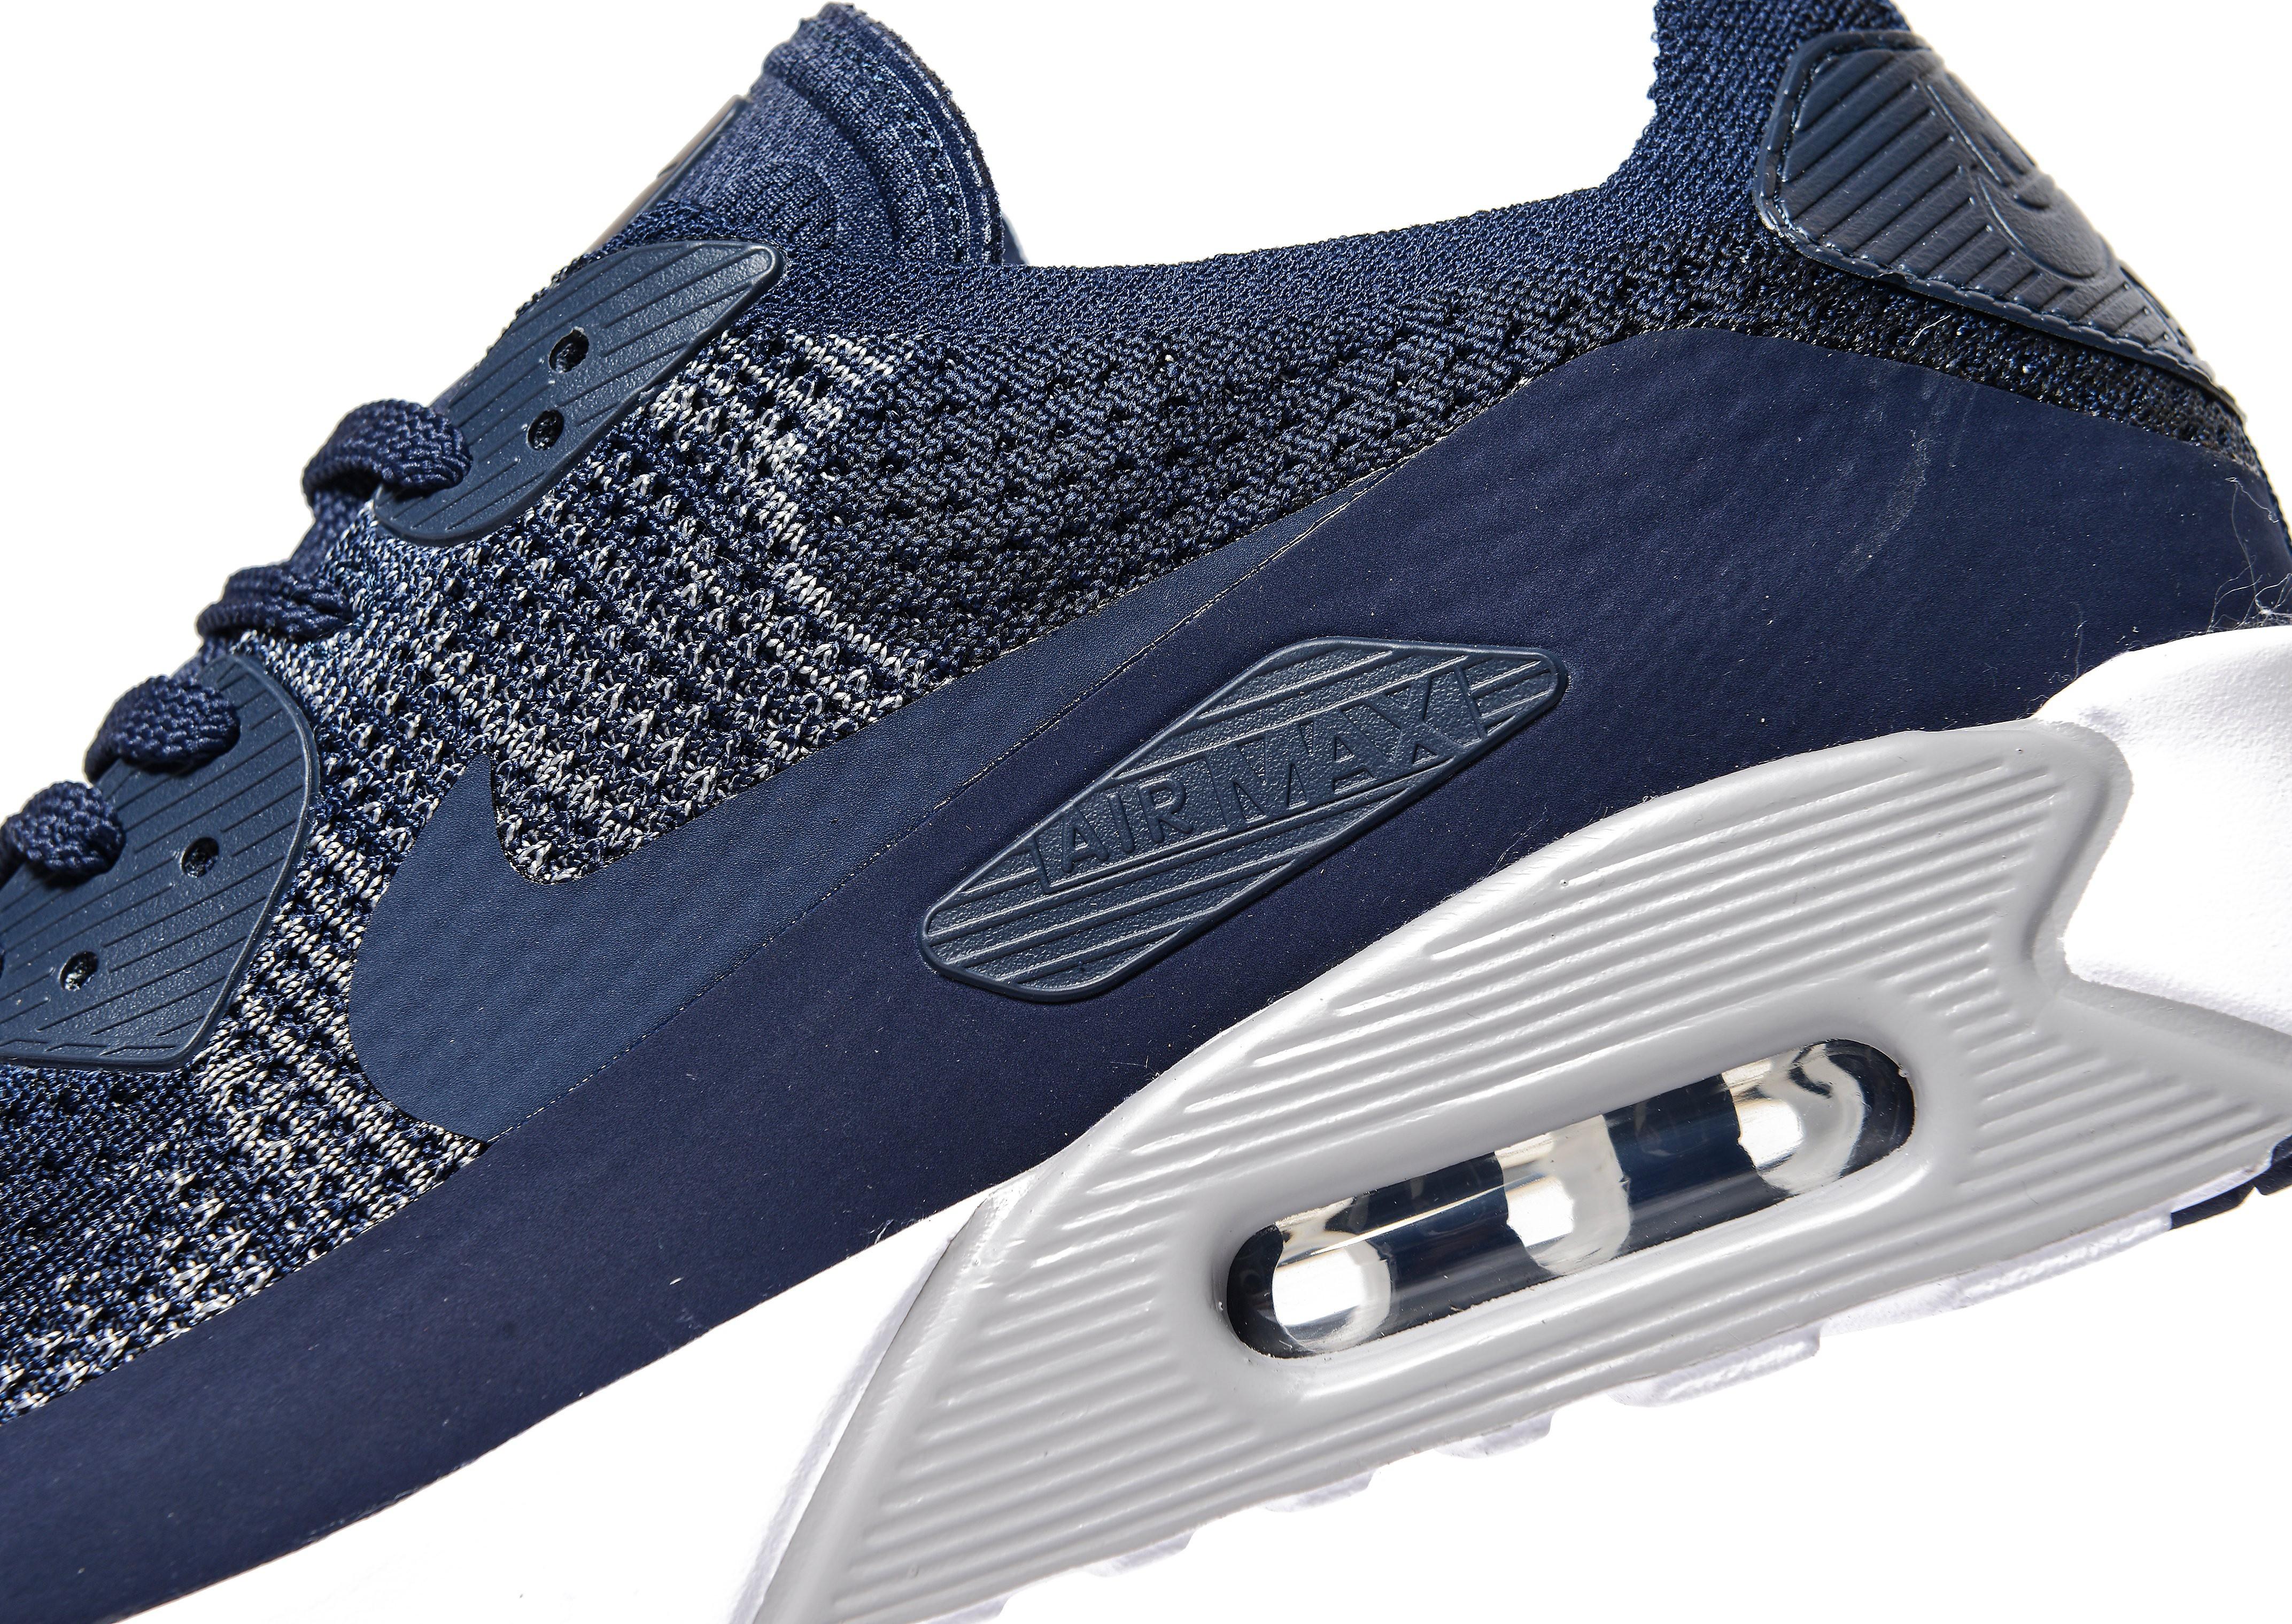 Nike Air Max 90 Flyknit 2.0